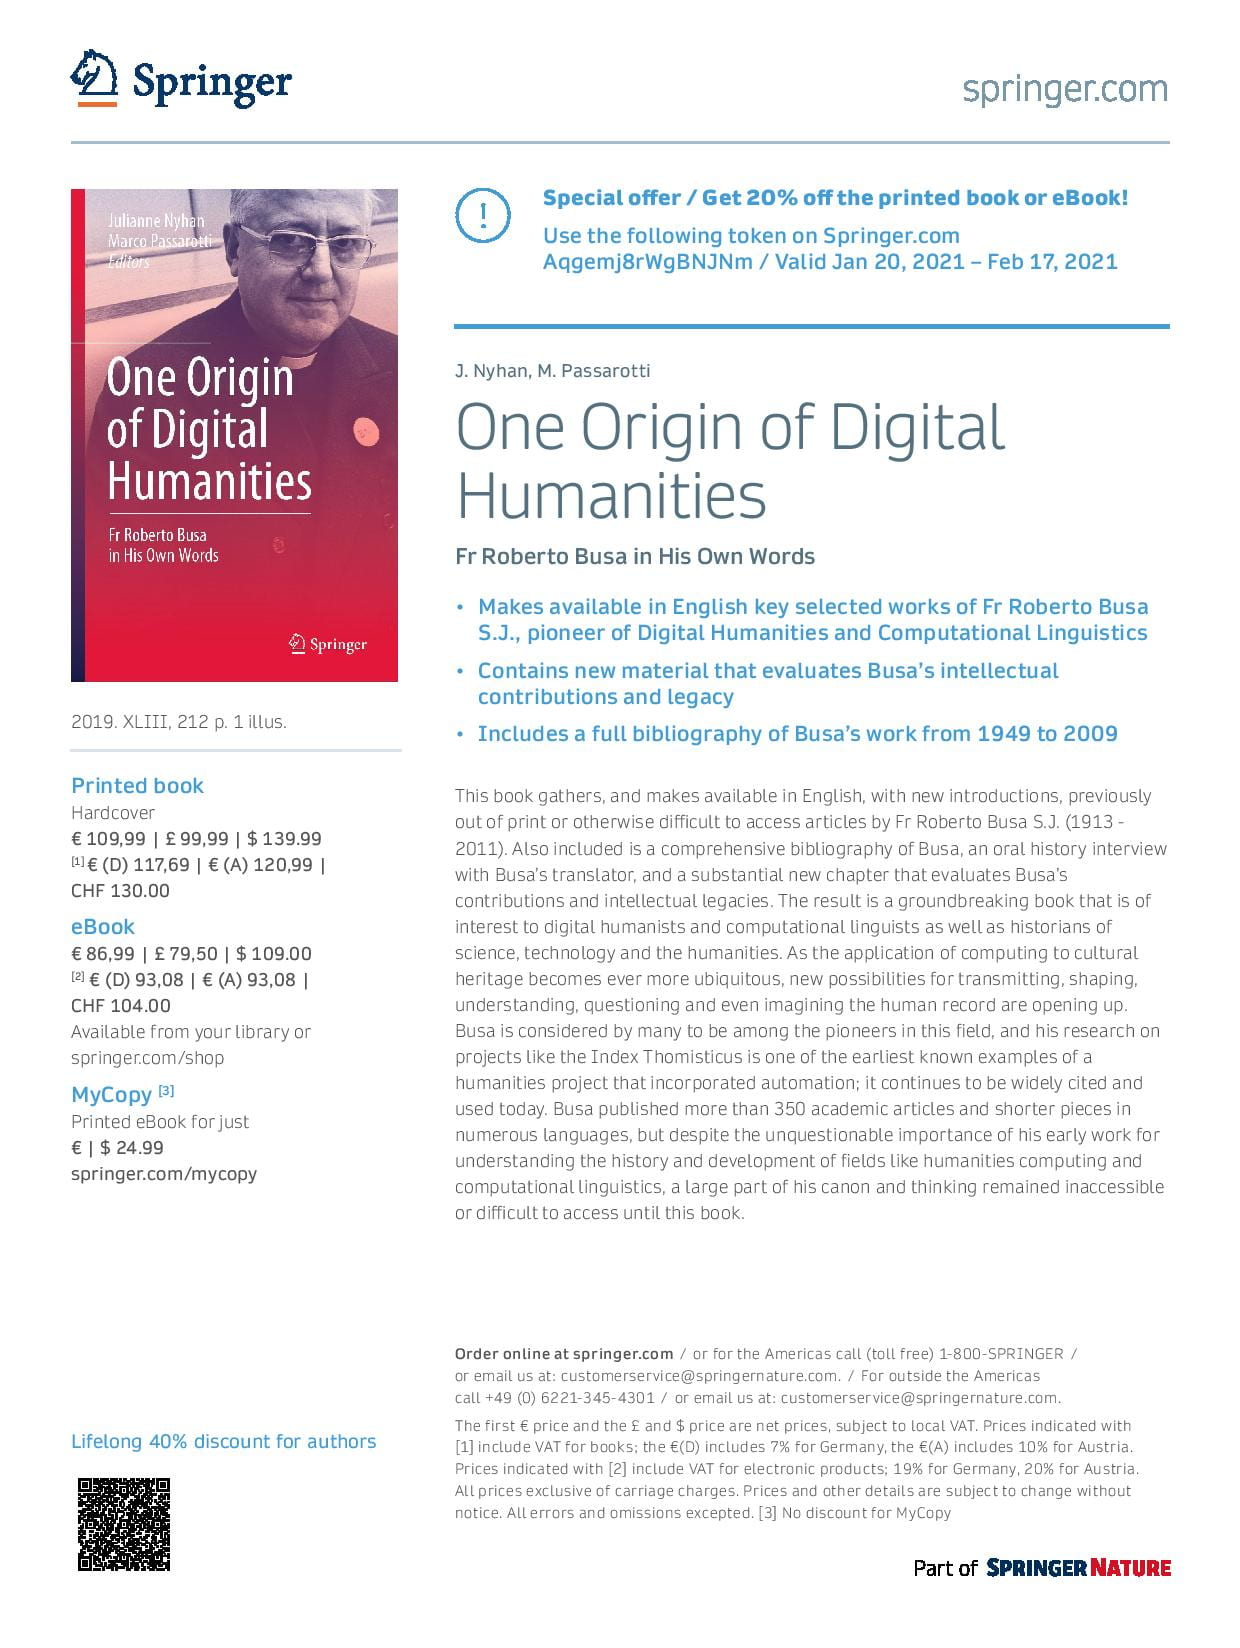 20% discount flyer 'One origin of DH'